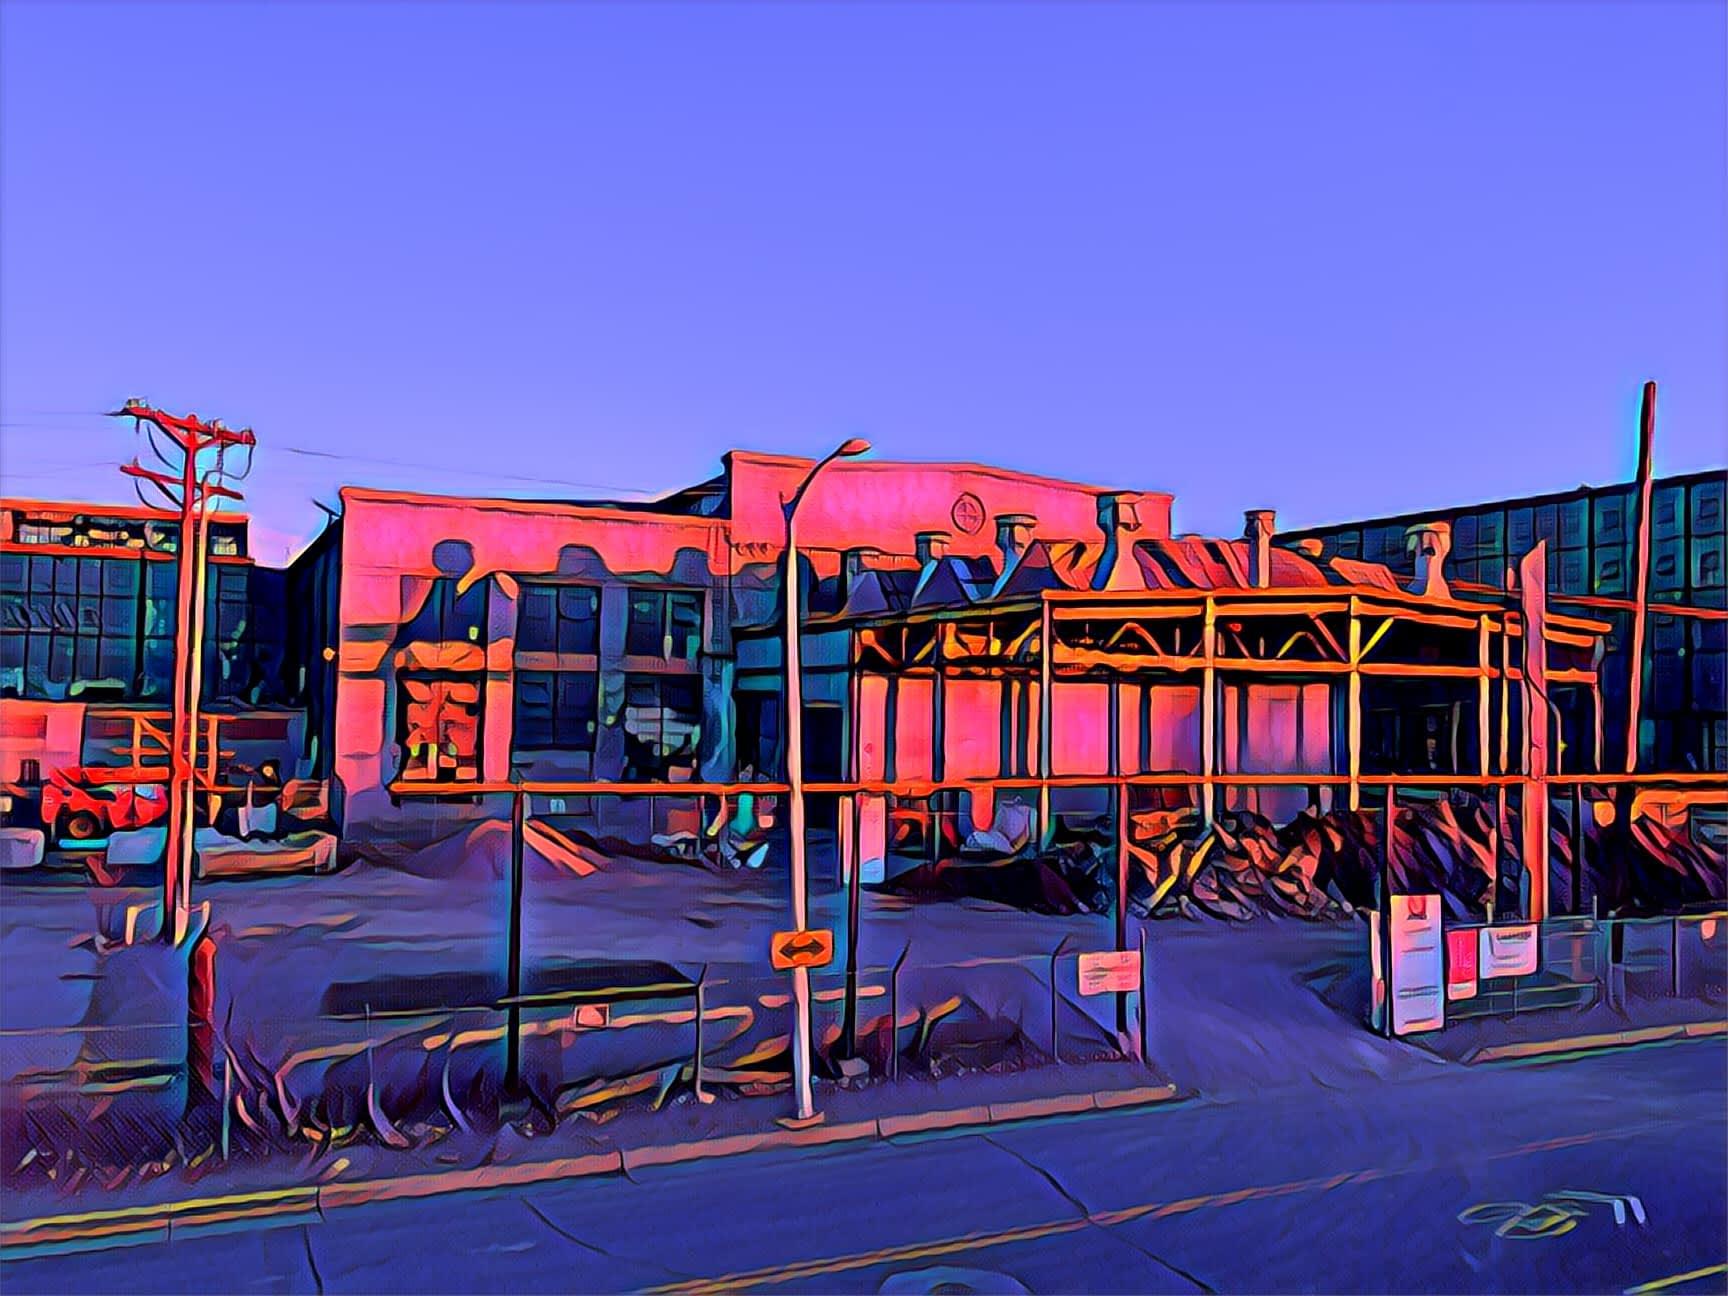 Rail Yard Digital Painting